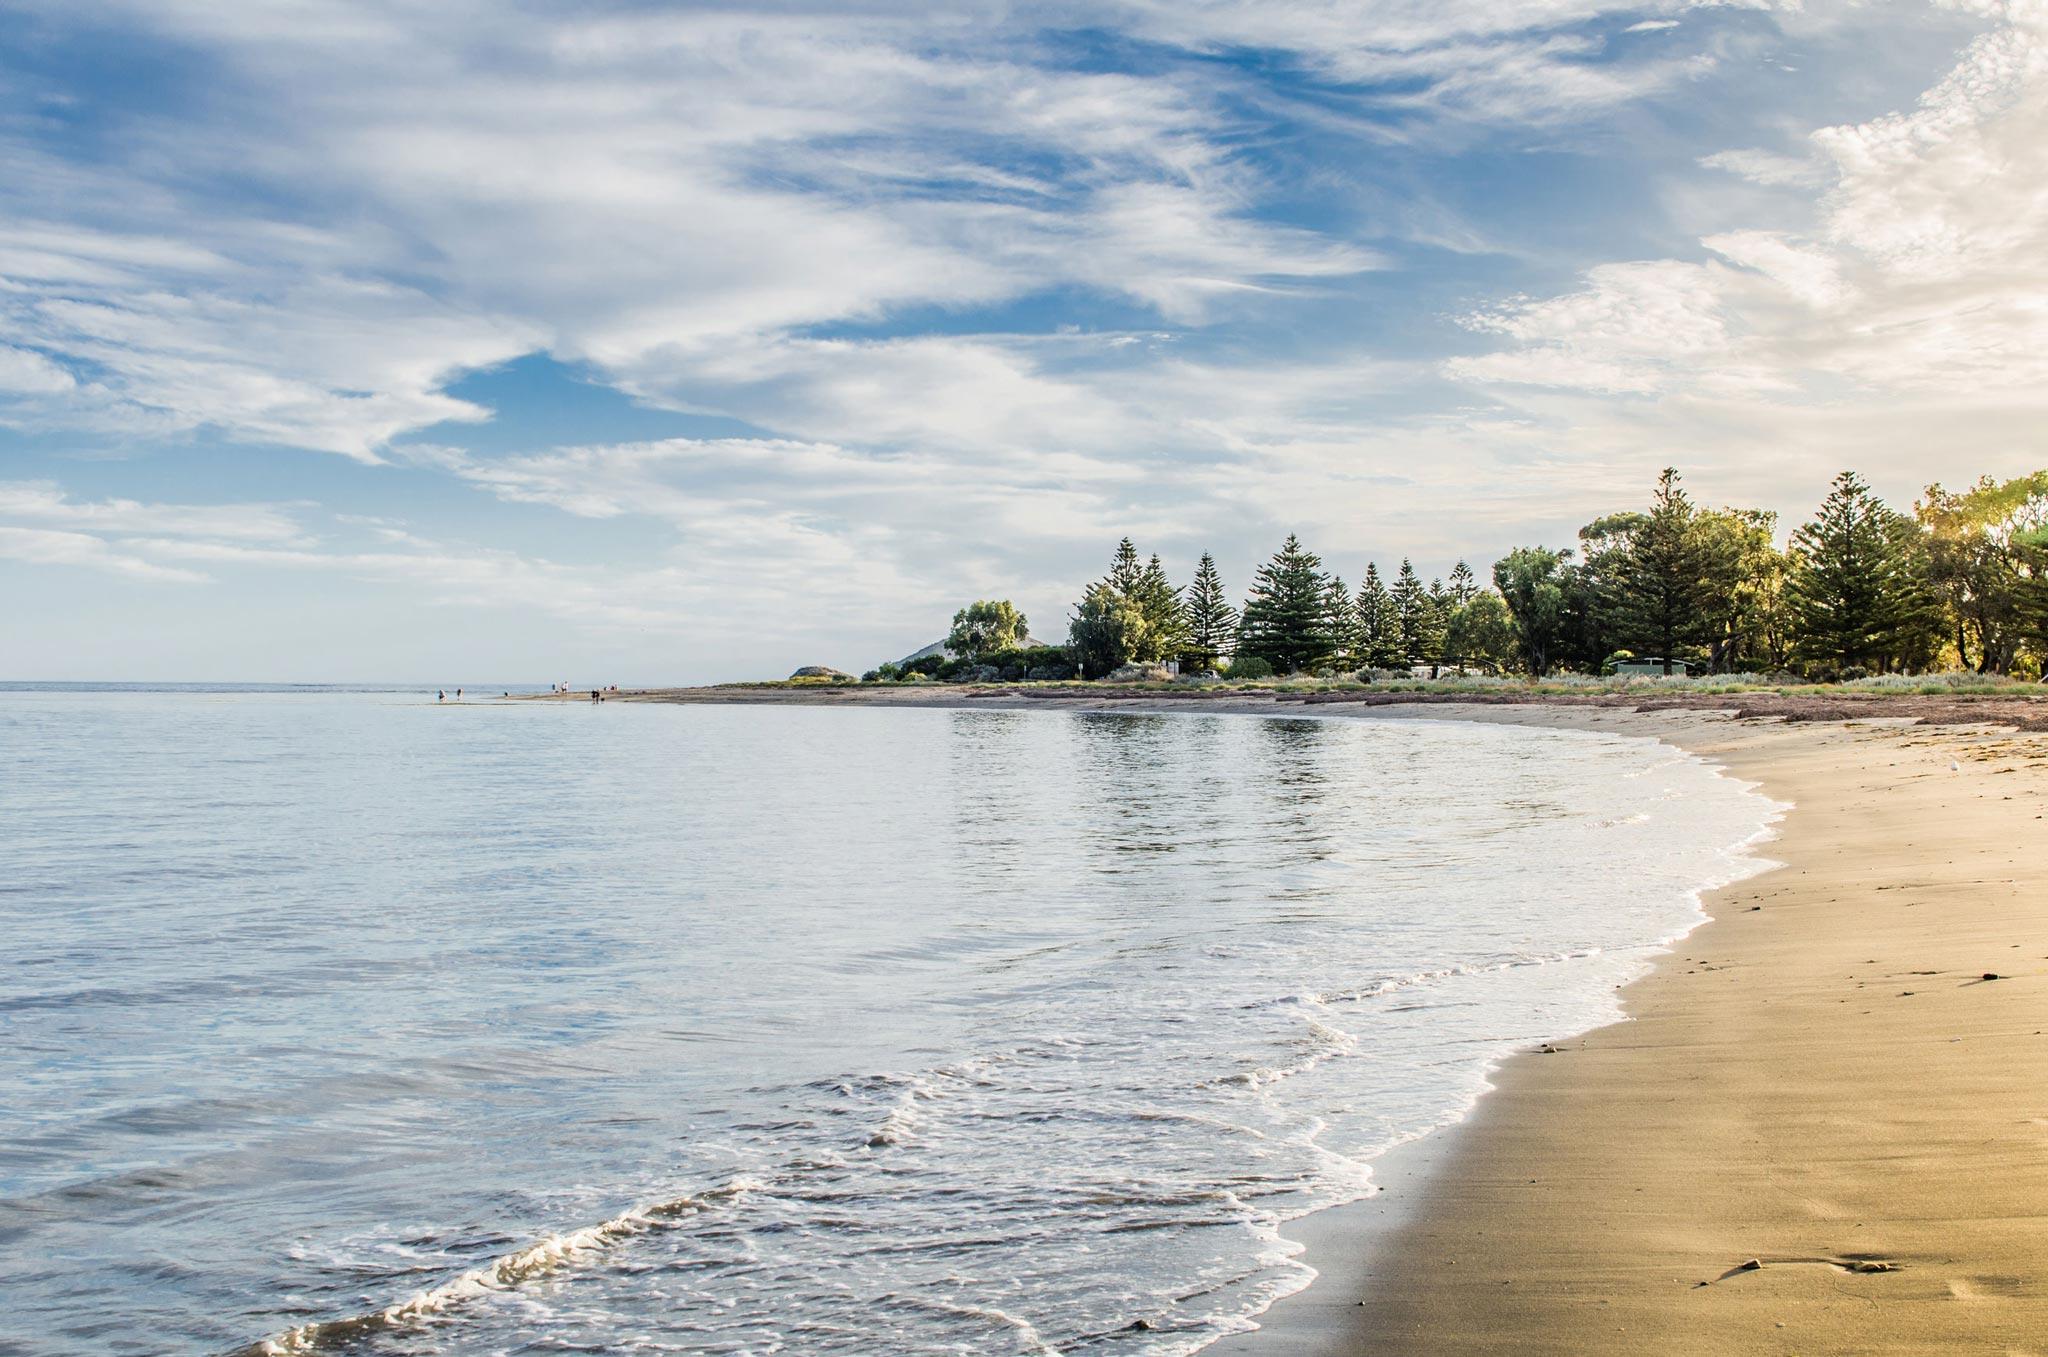 Paesaggi-Australia - DSC 0705 - Fotografo di Paesaggi Australia South Australia - Fotografo di Paesaggi Australia South Australia